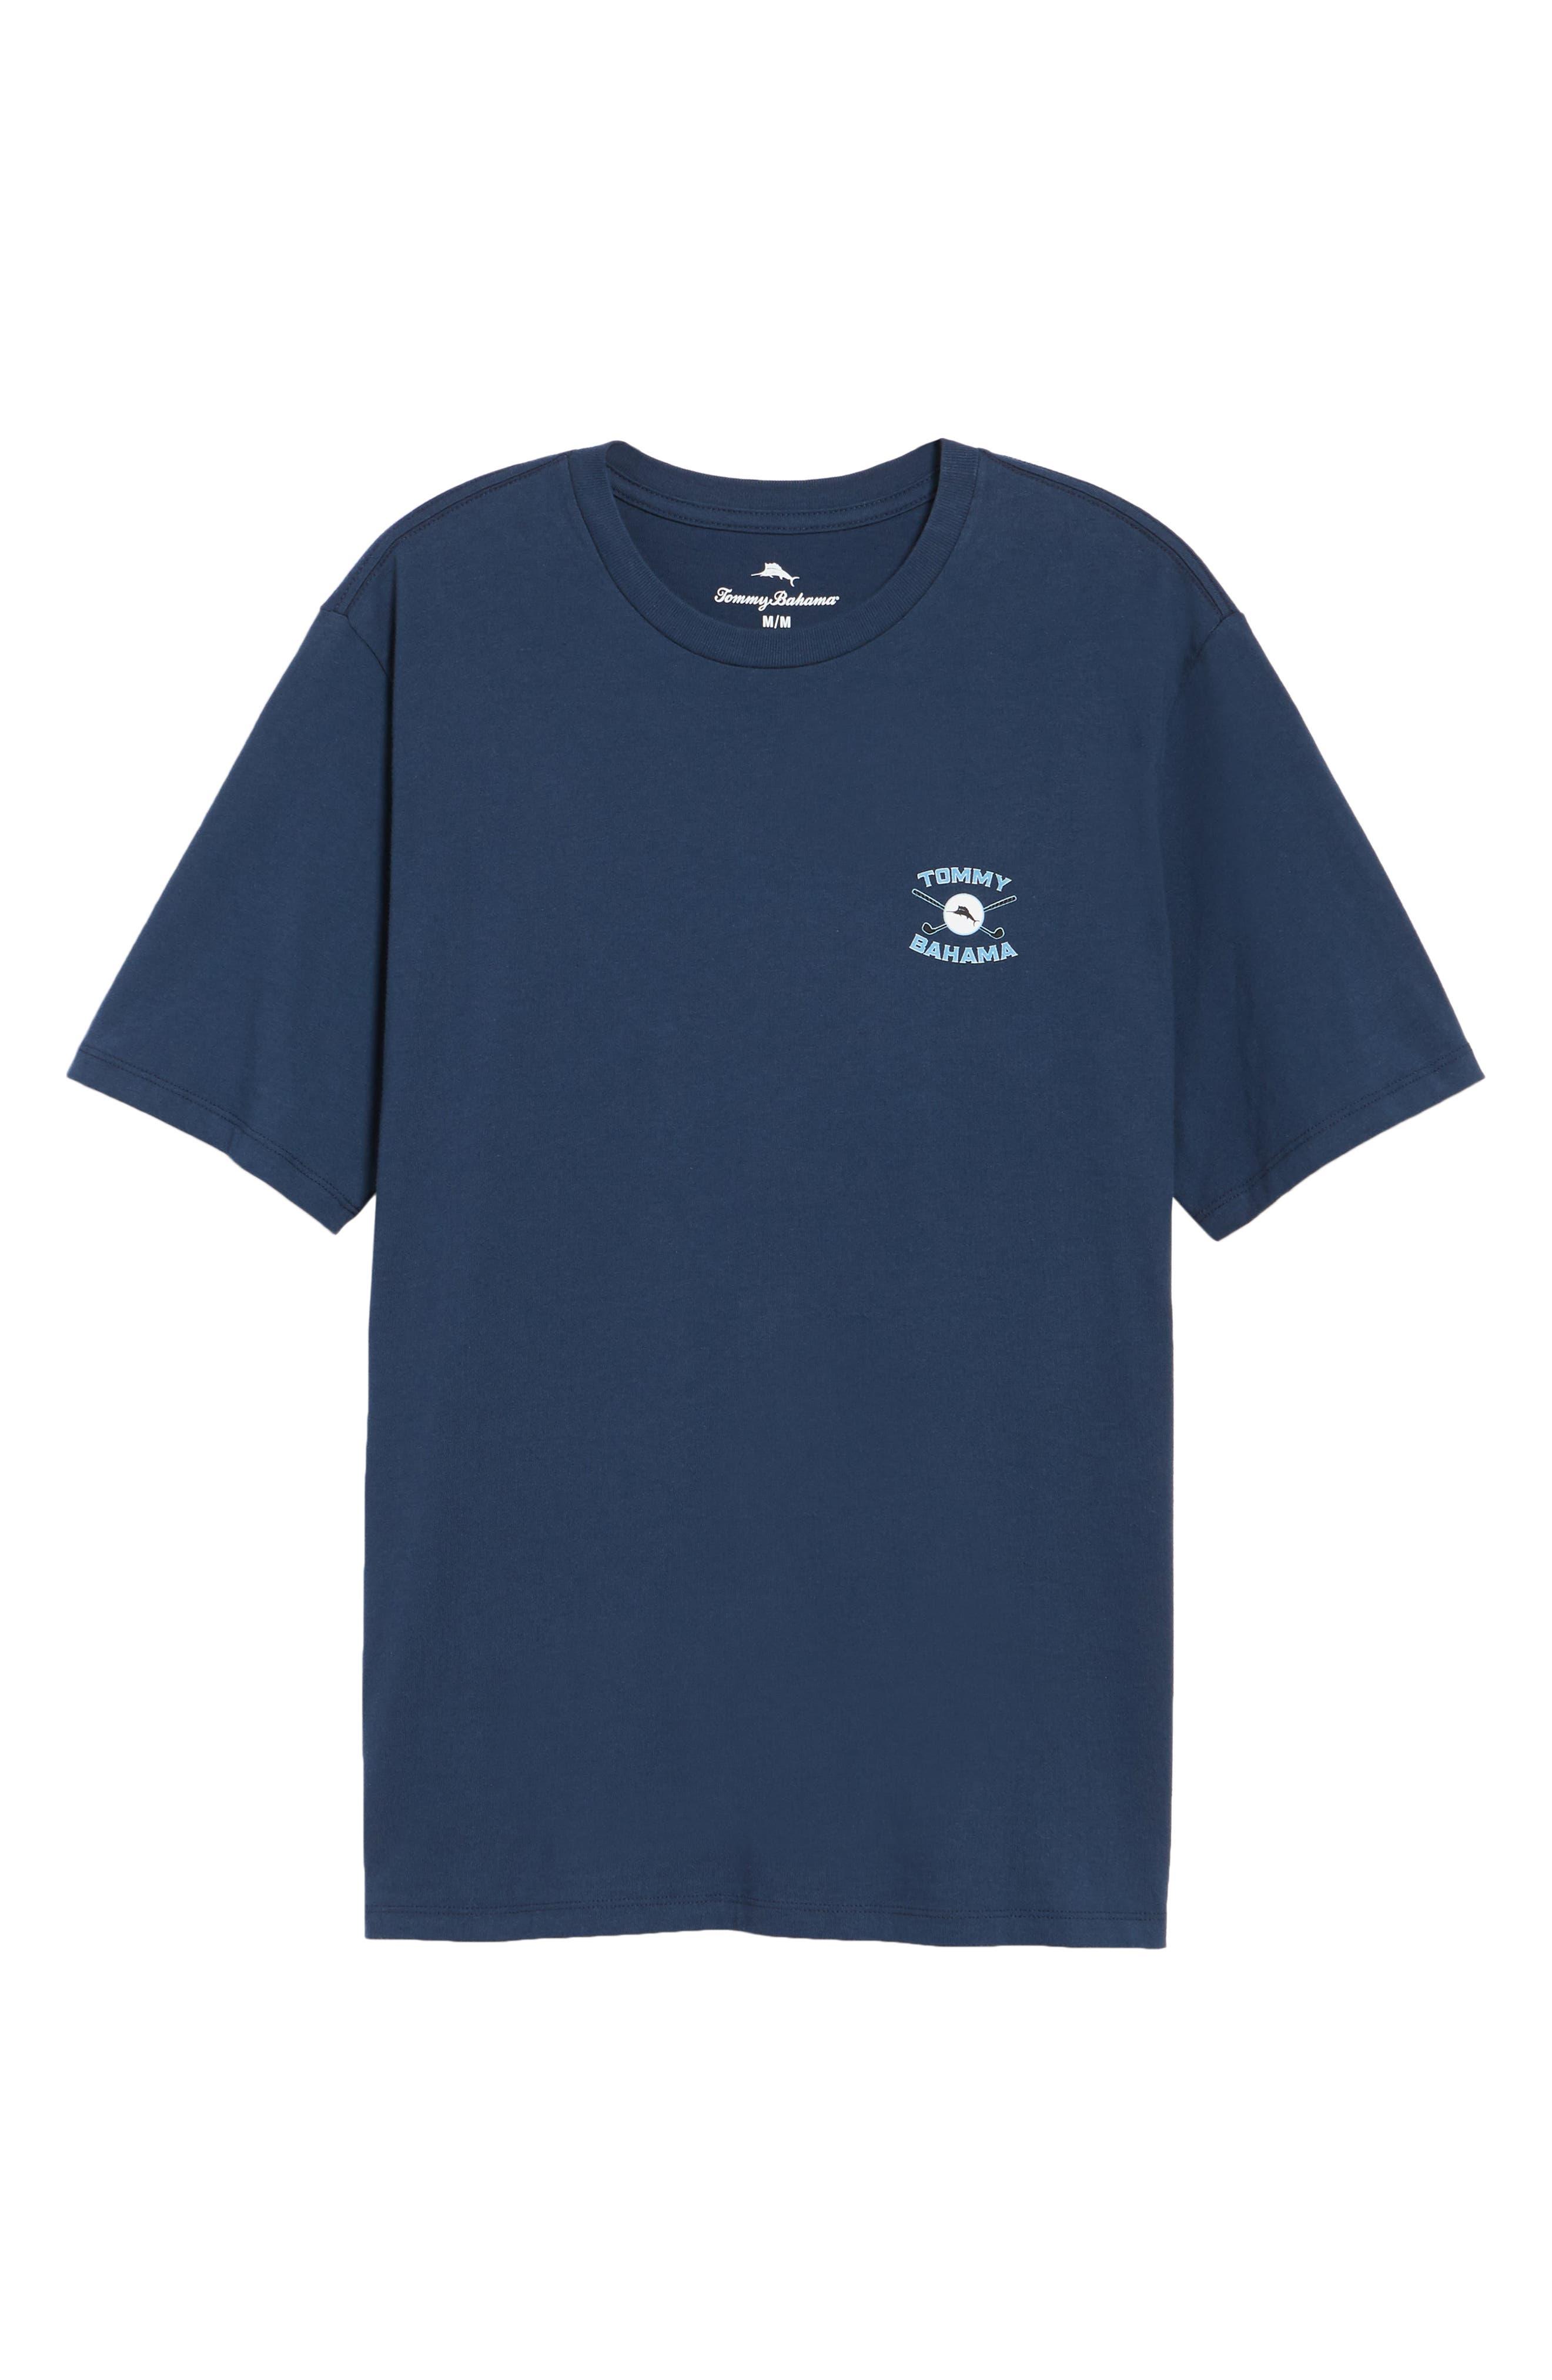 TOMMY BAHAMA,                             The Lawn Ranger T-Shirt,                             Alternate thumbnail 6, color,                             400